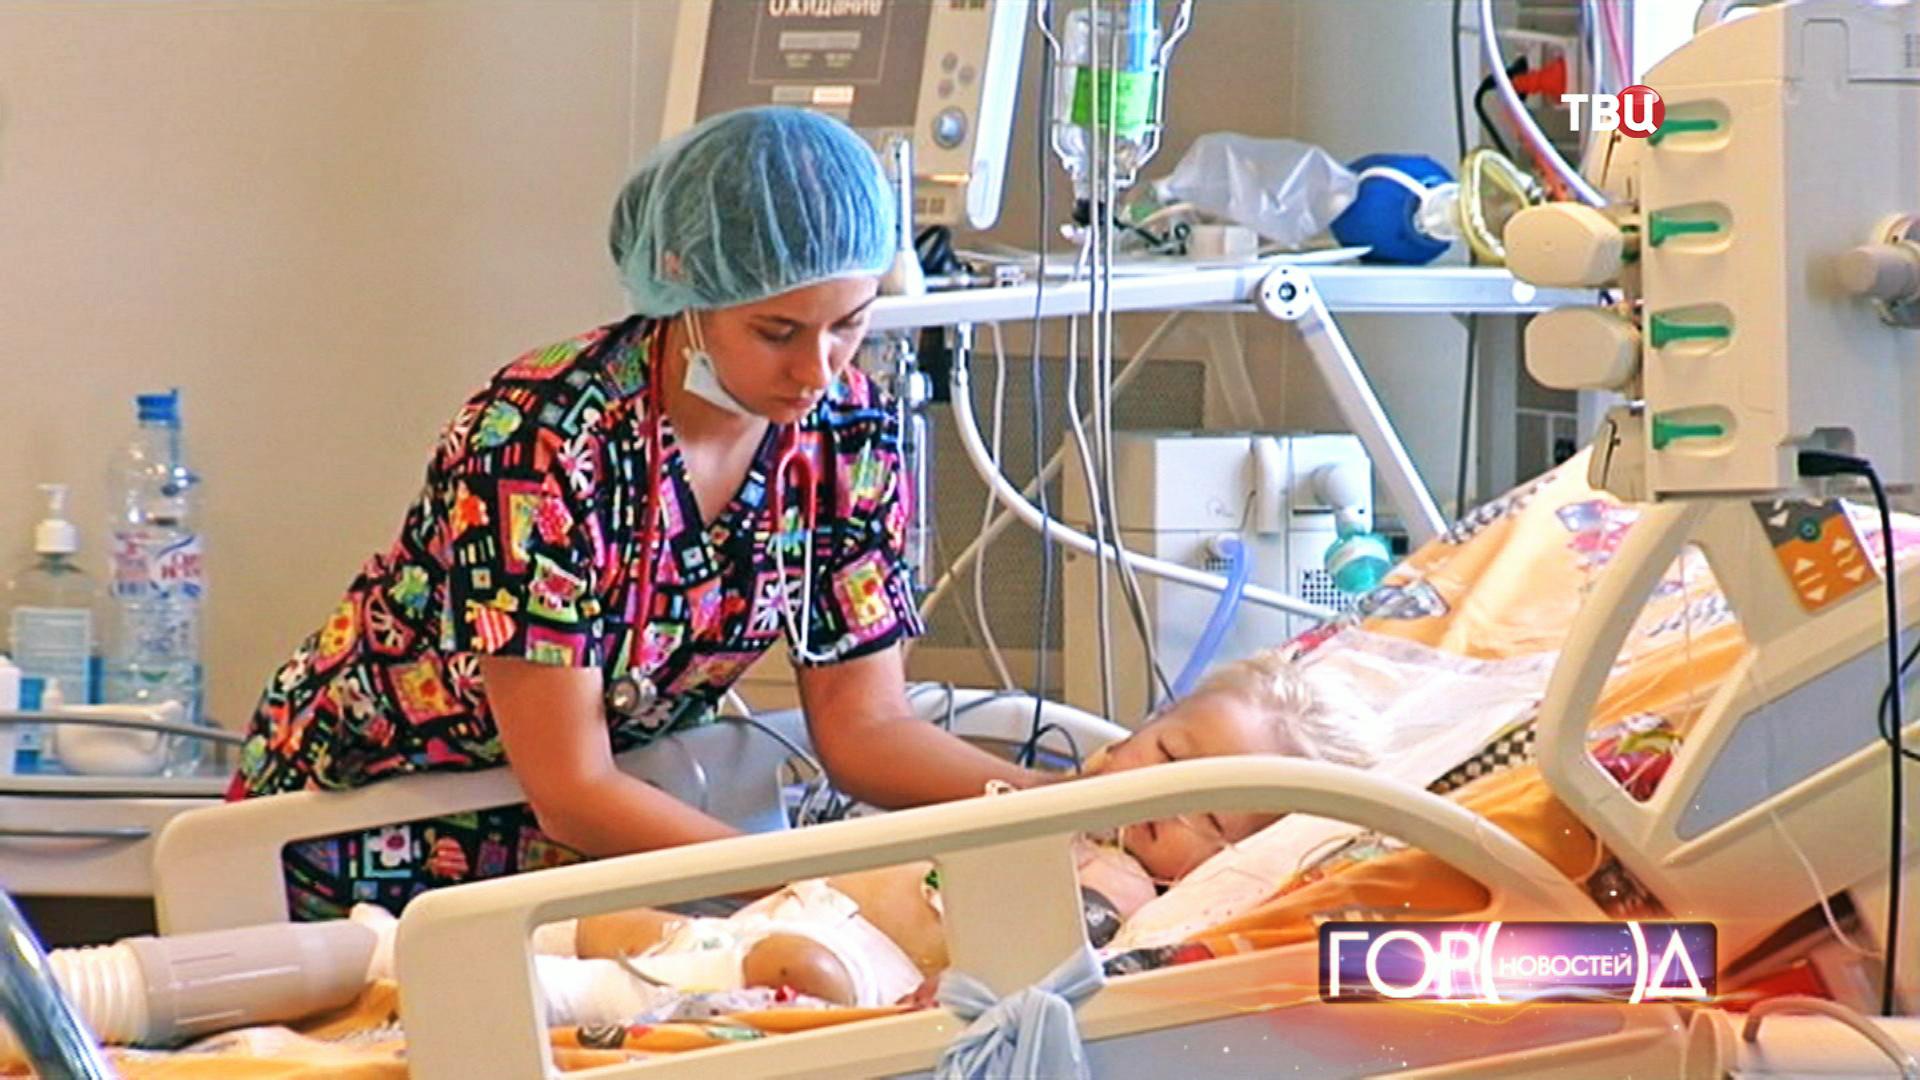 Медсестра осматривает ребенка